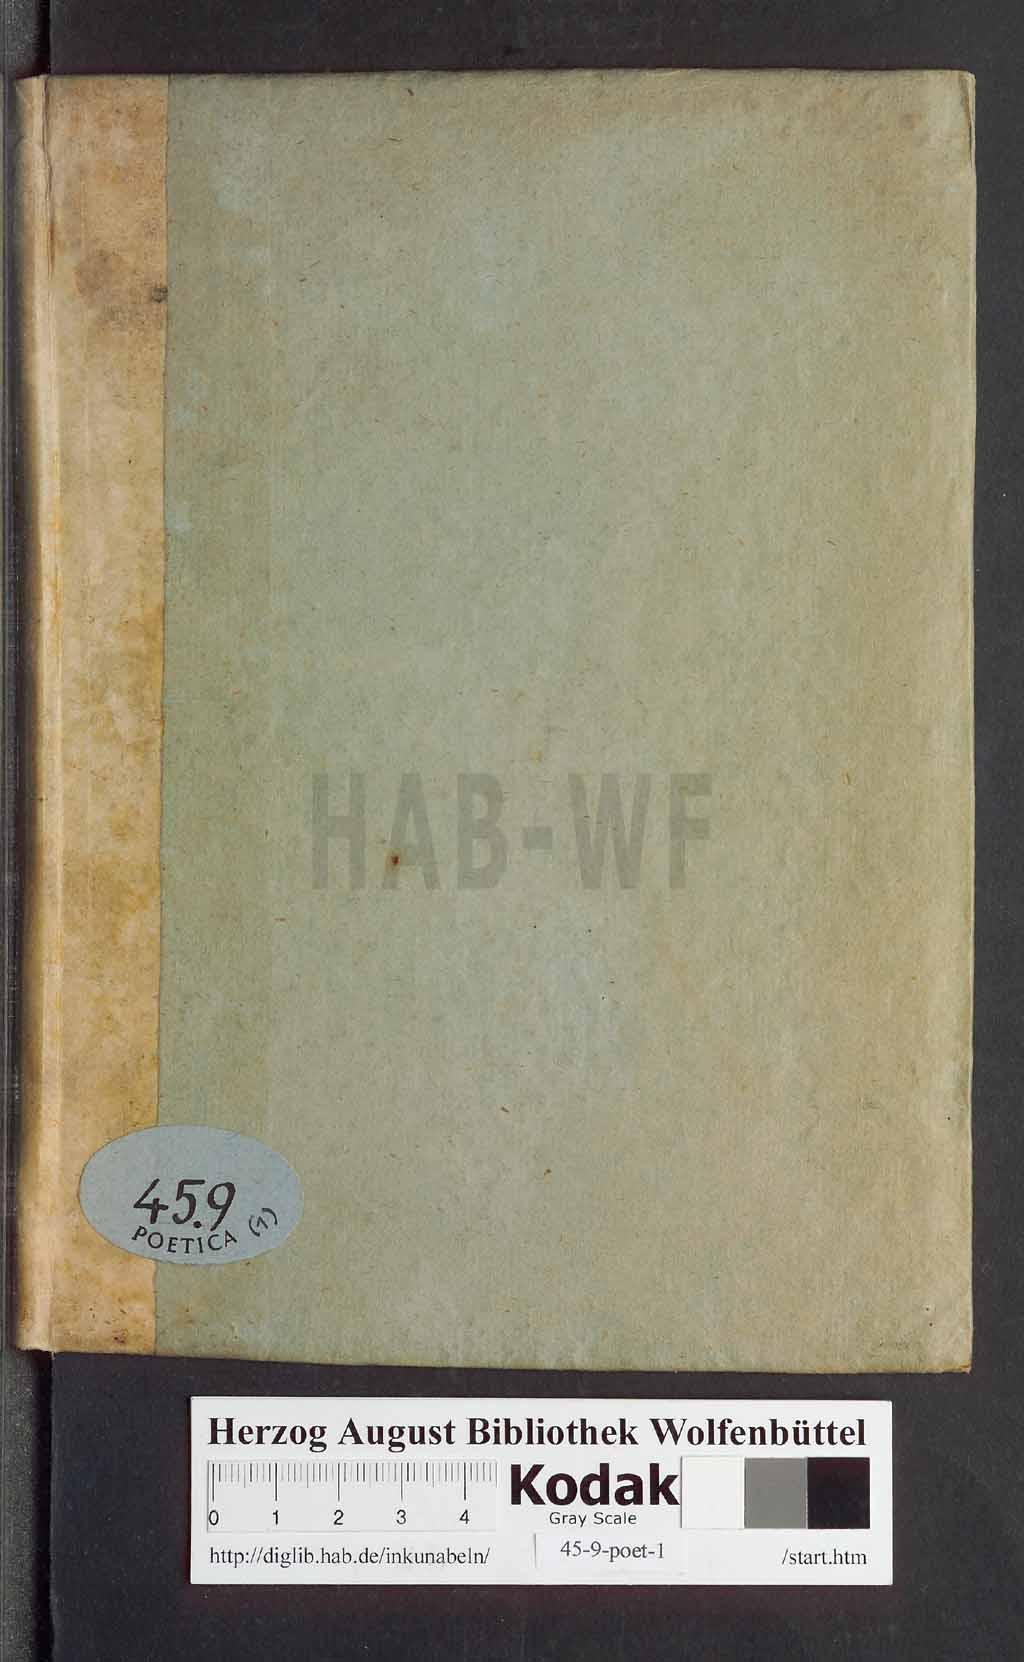 http://diglib.hab.de/inkunabeln/45-9-poet-1/00001.jpg